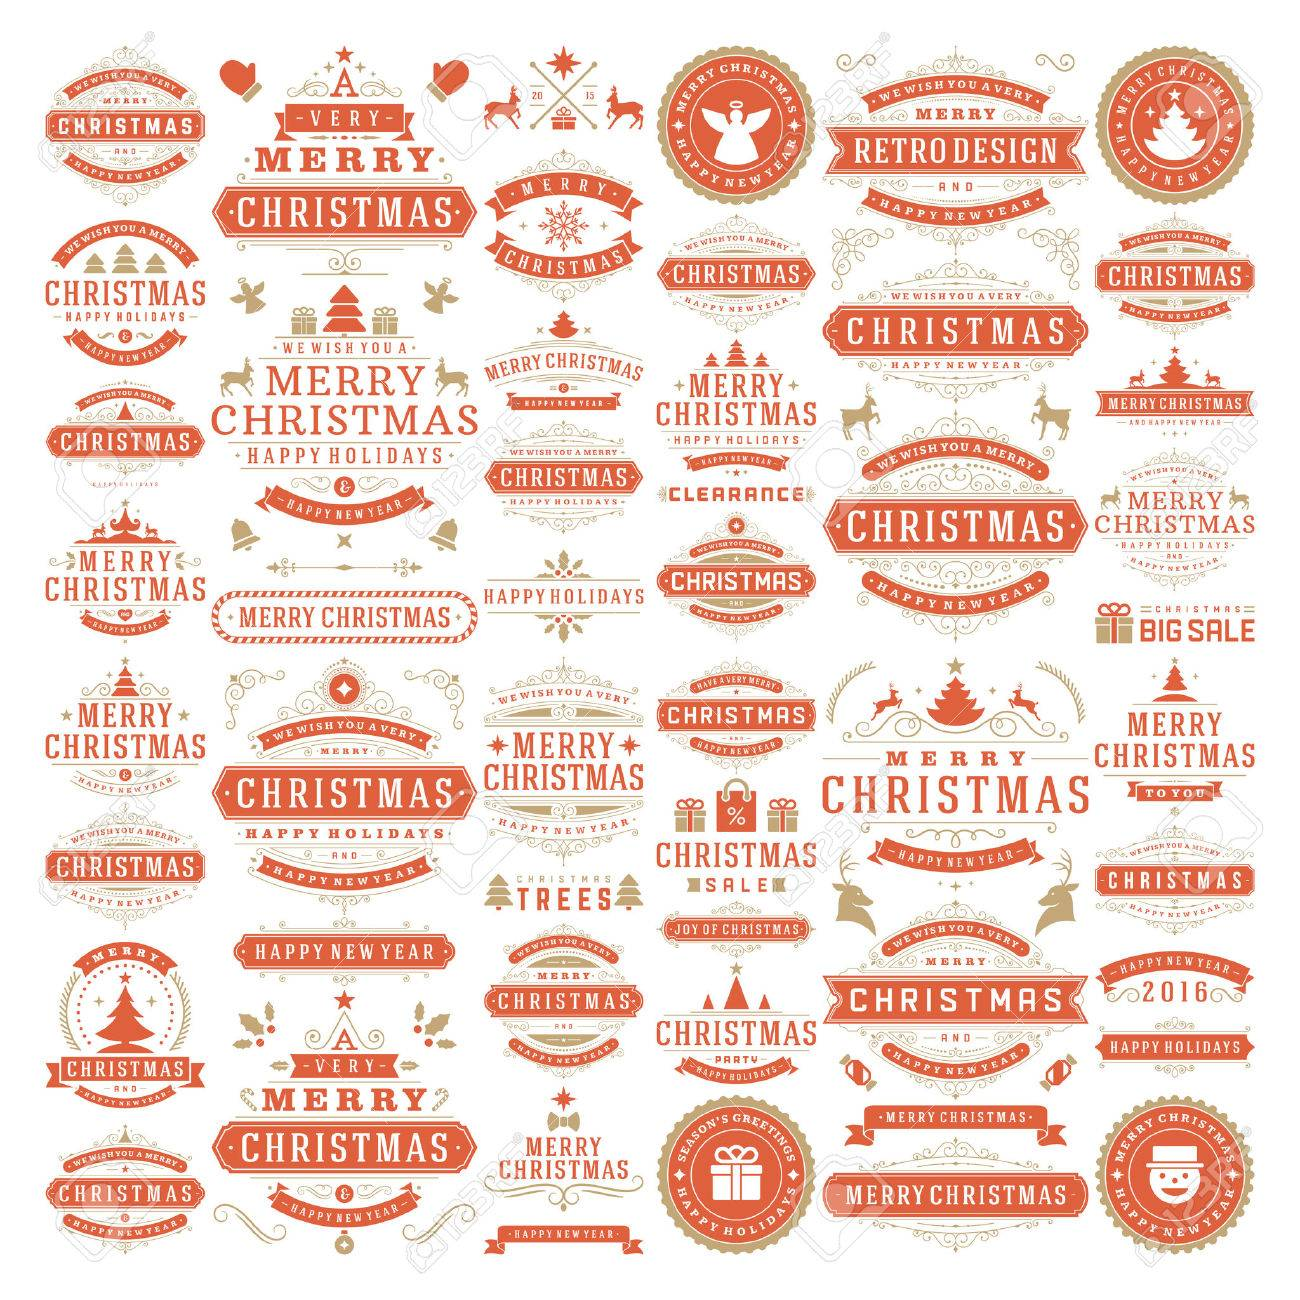 Christmas decorations vector design elements. Typographic messages, vintage labels, frames ribbons, badges logos, ornaments set. Flourishes calligraphic. Big Collection. - 46483650